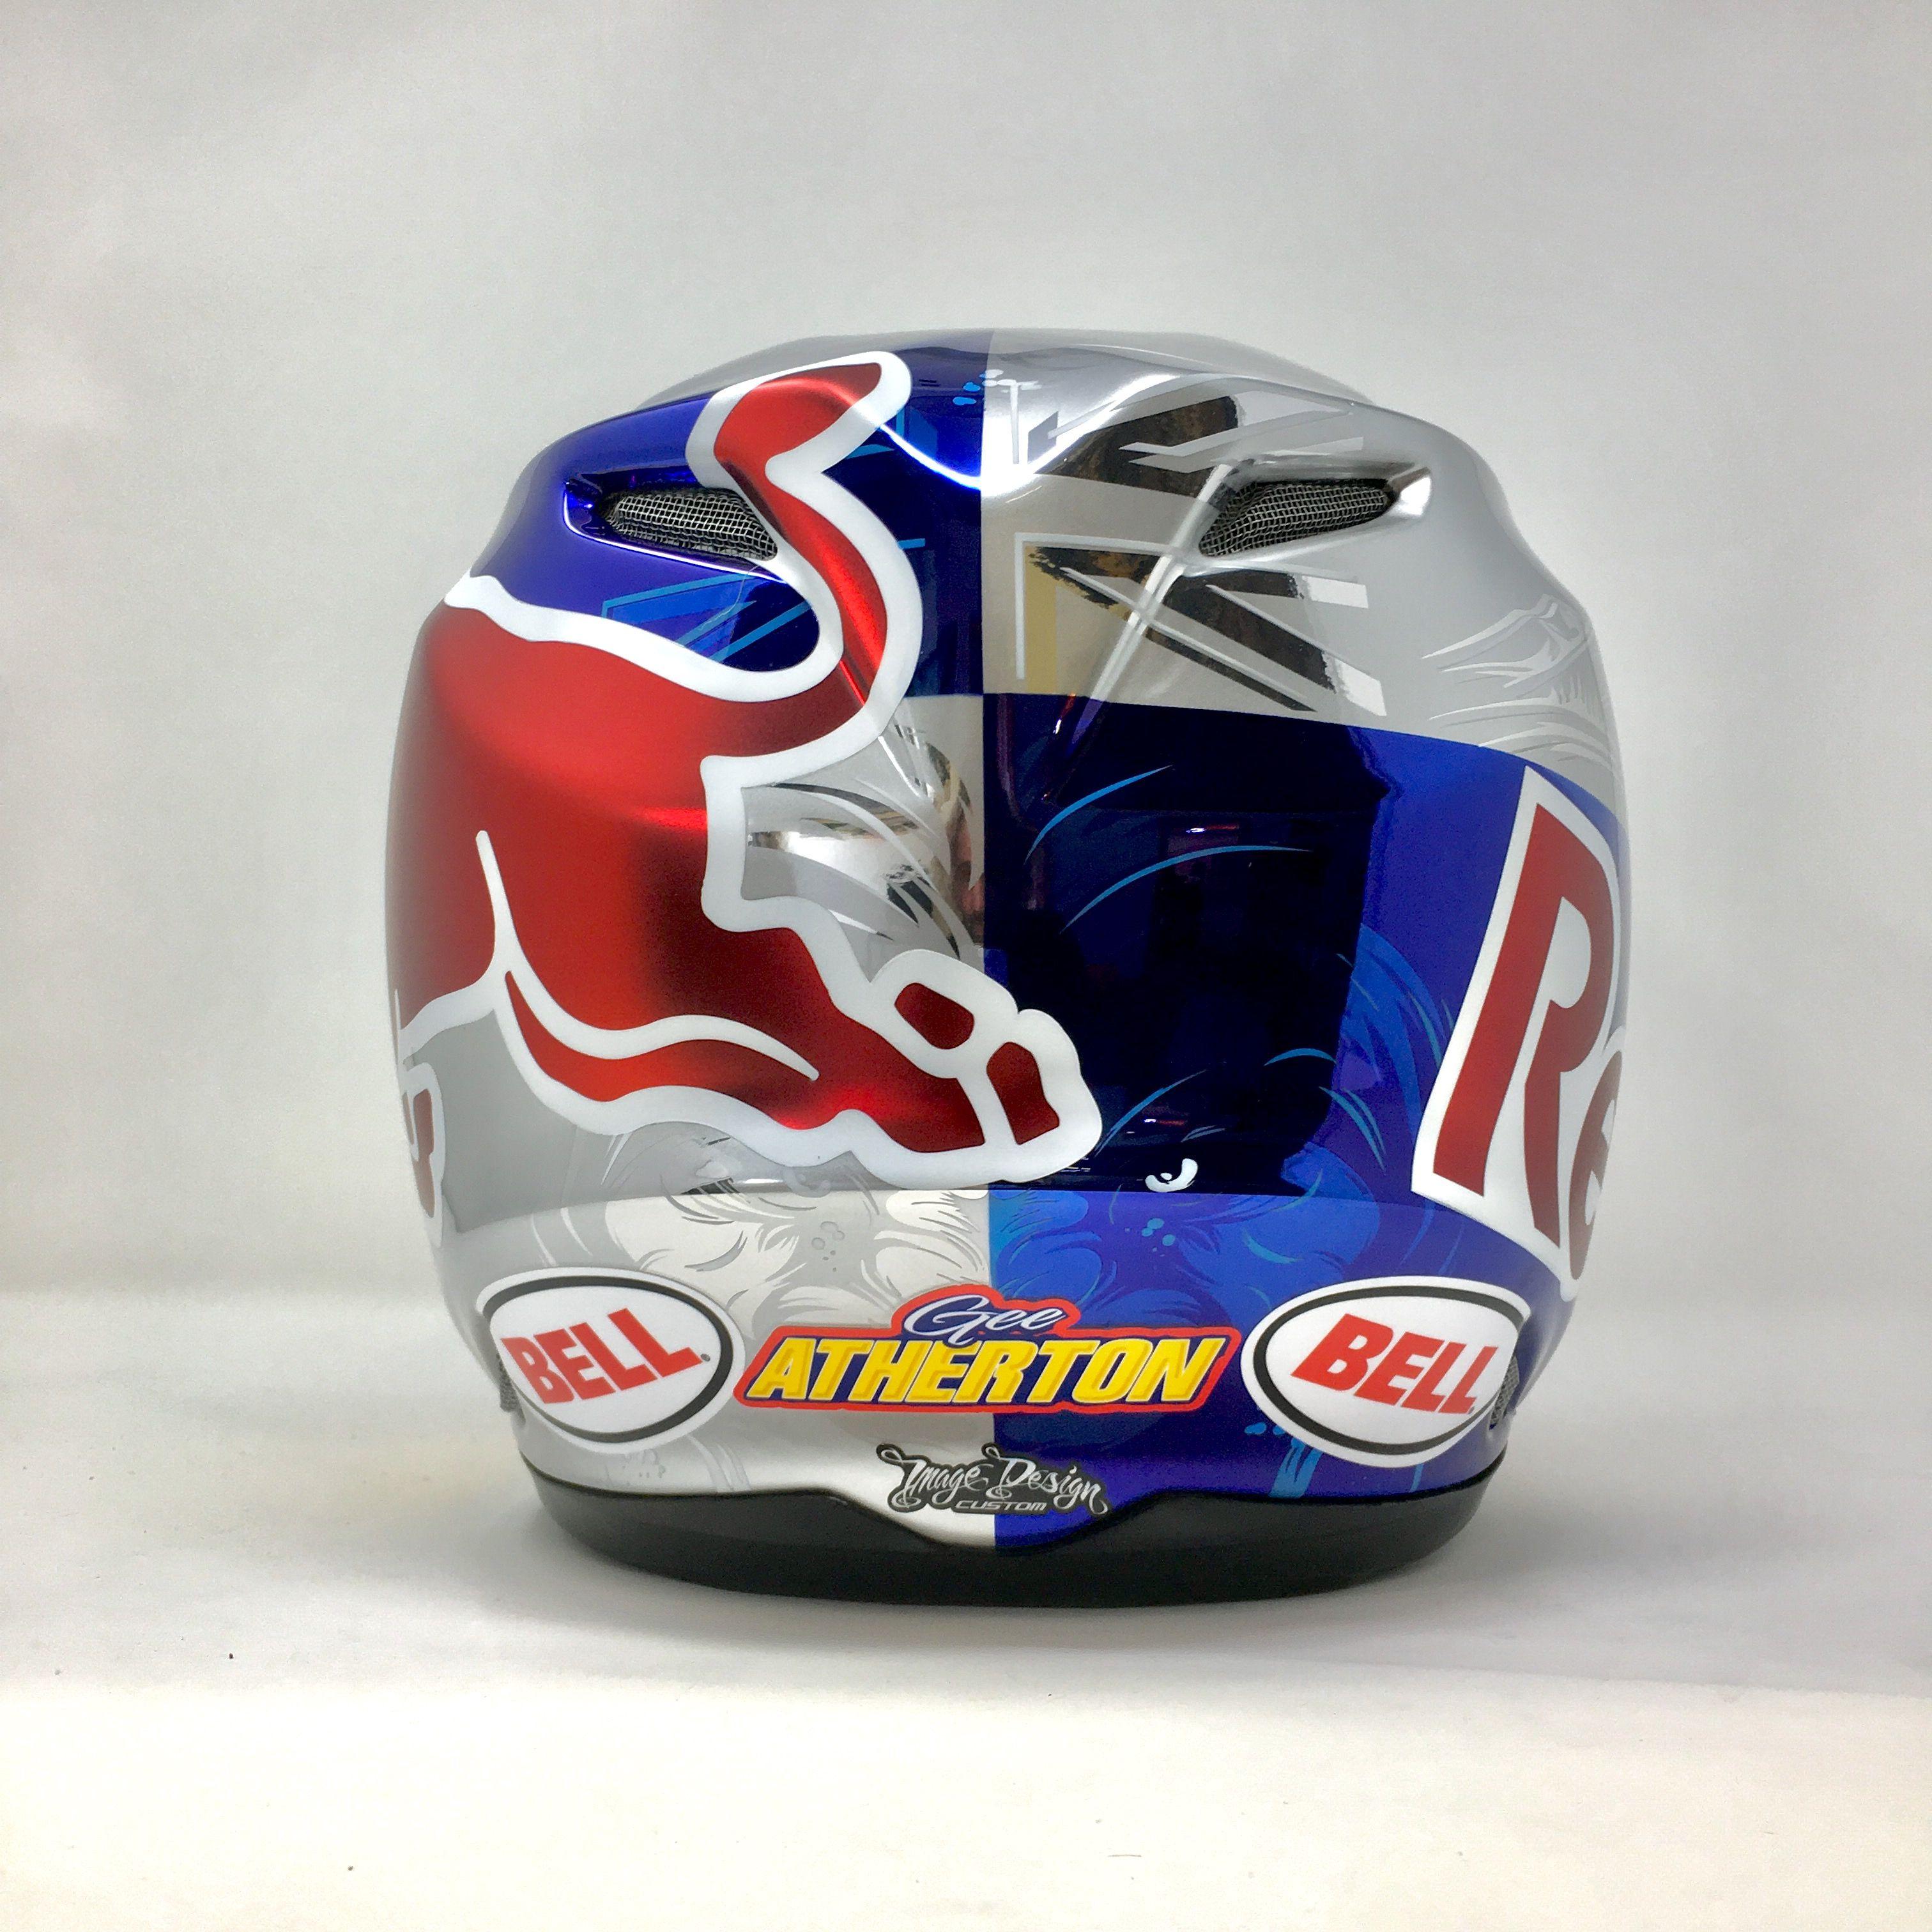 Gee Atherton Redbull Custom Painted Bell Helmet In Chrome 2018